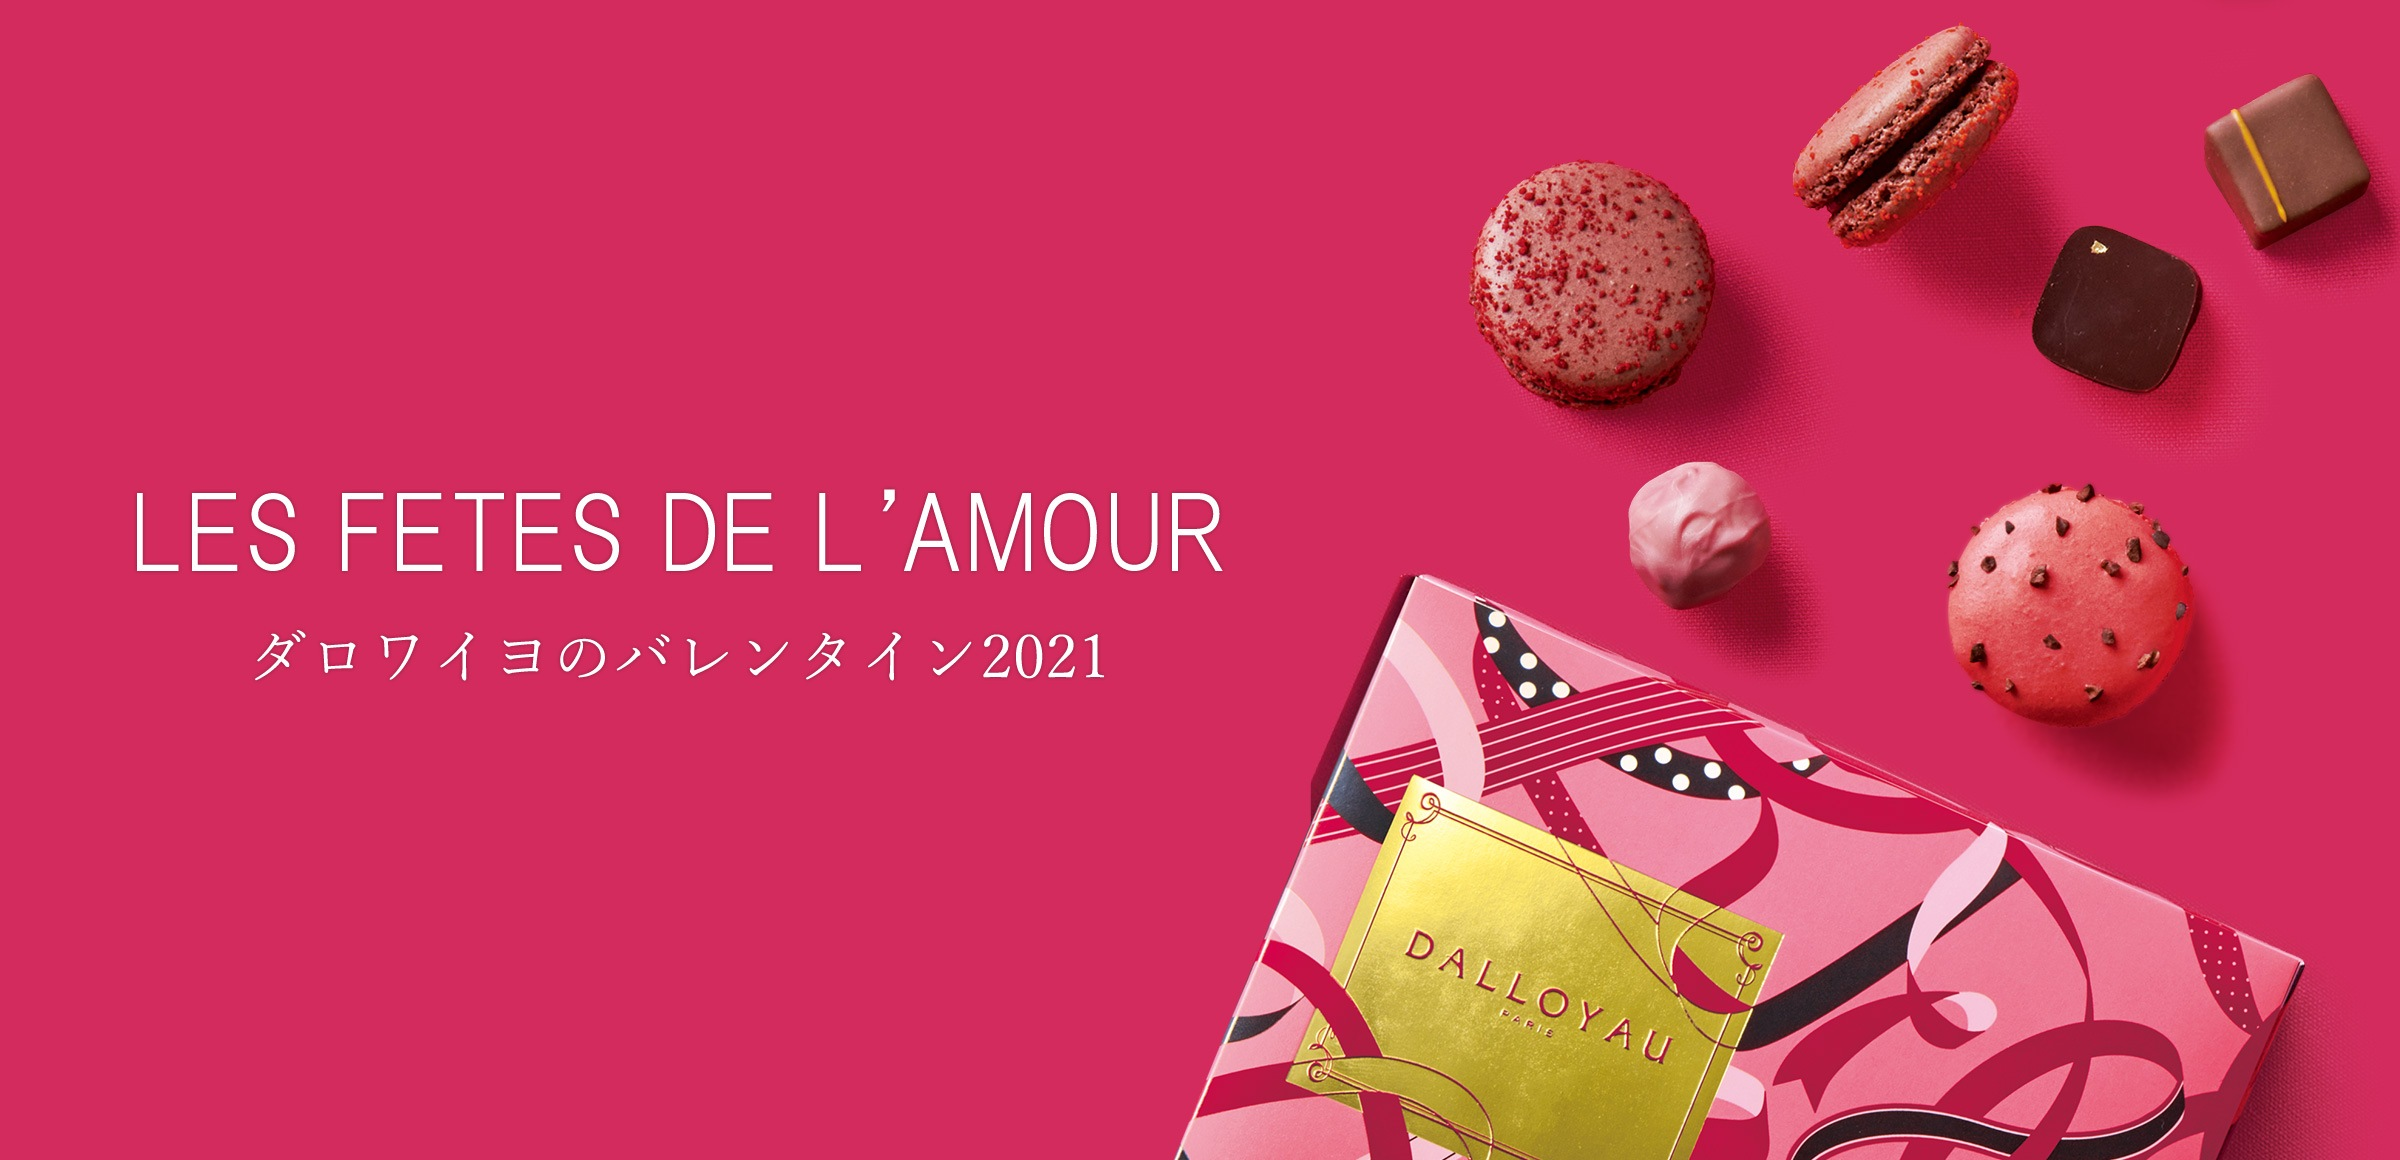 LES FETES DE L'AMOUR ダロワイヨのバレンタイン2021